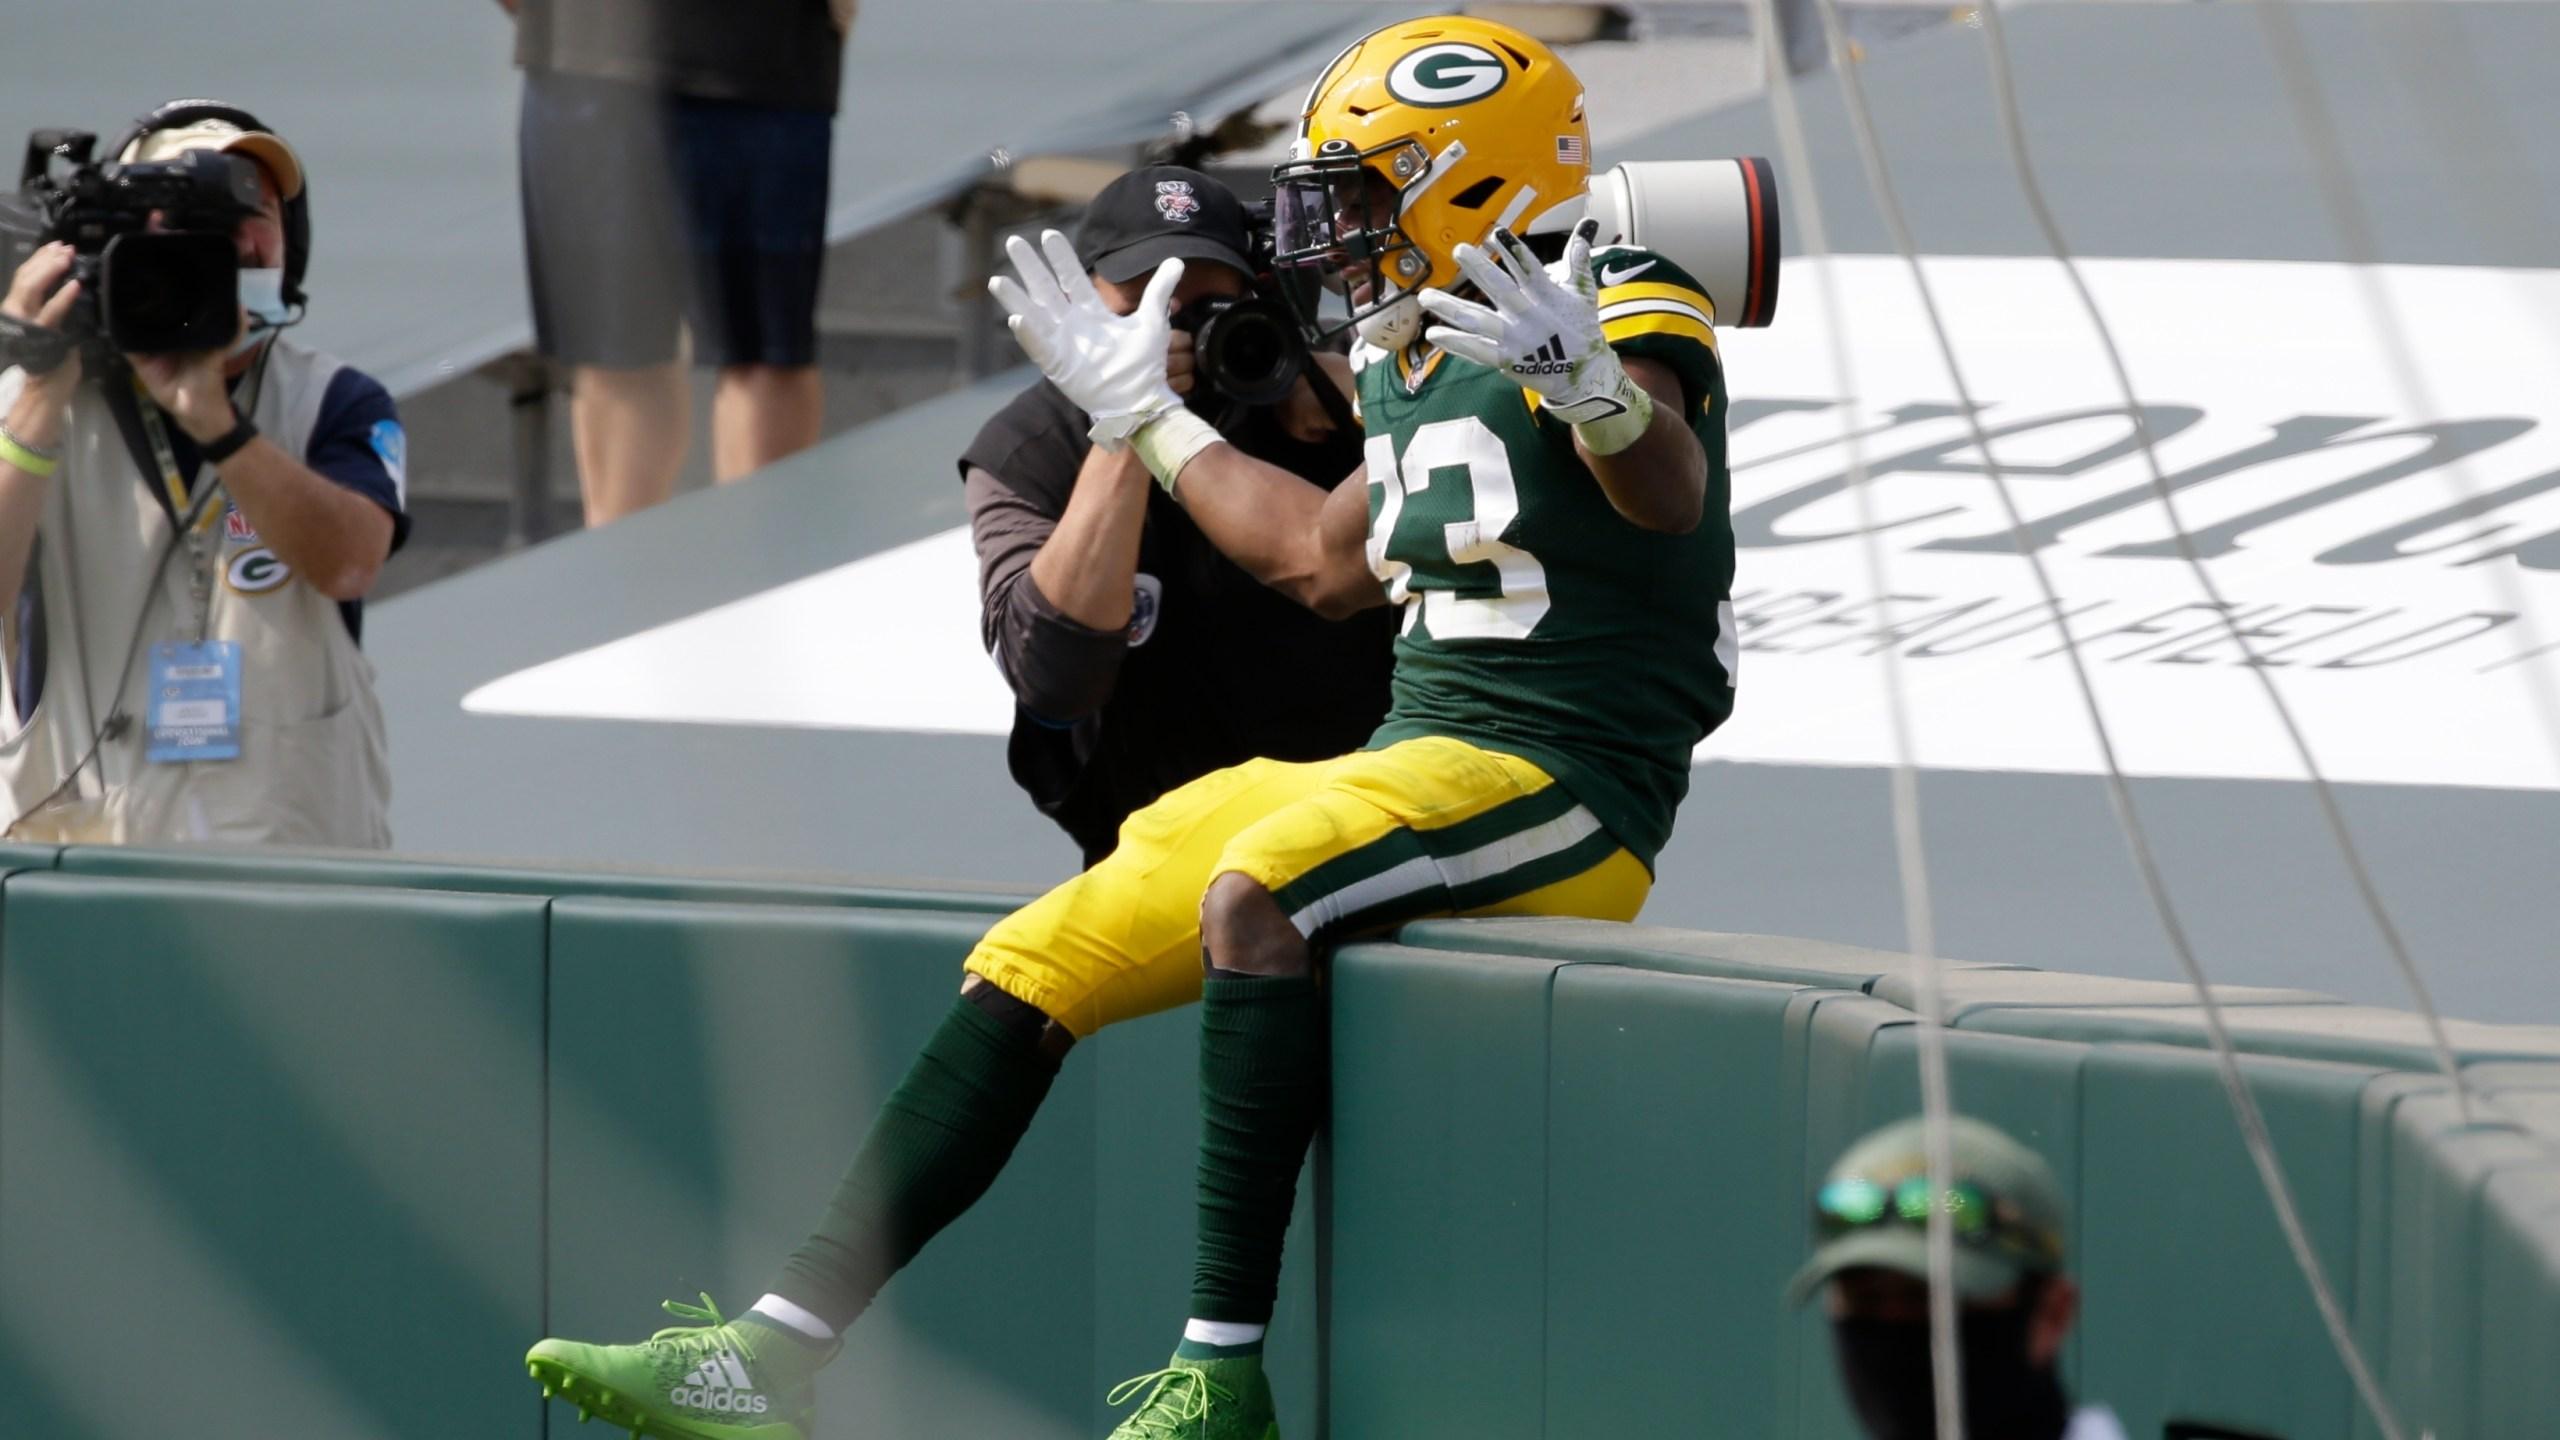 Jones Big Day Helps Packers Beat Lions 42 21 In Home Opener Krqe News 13